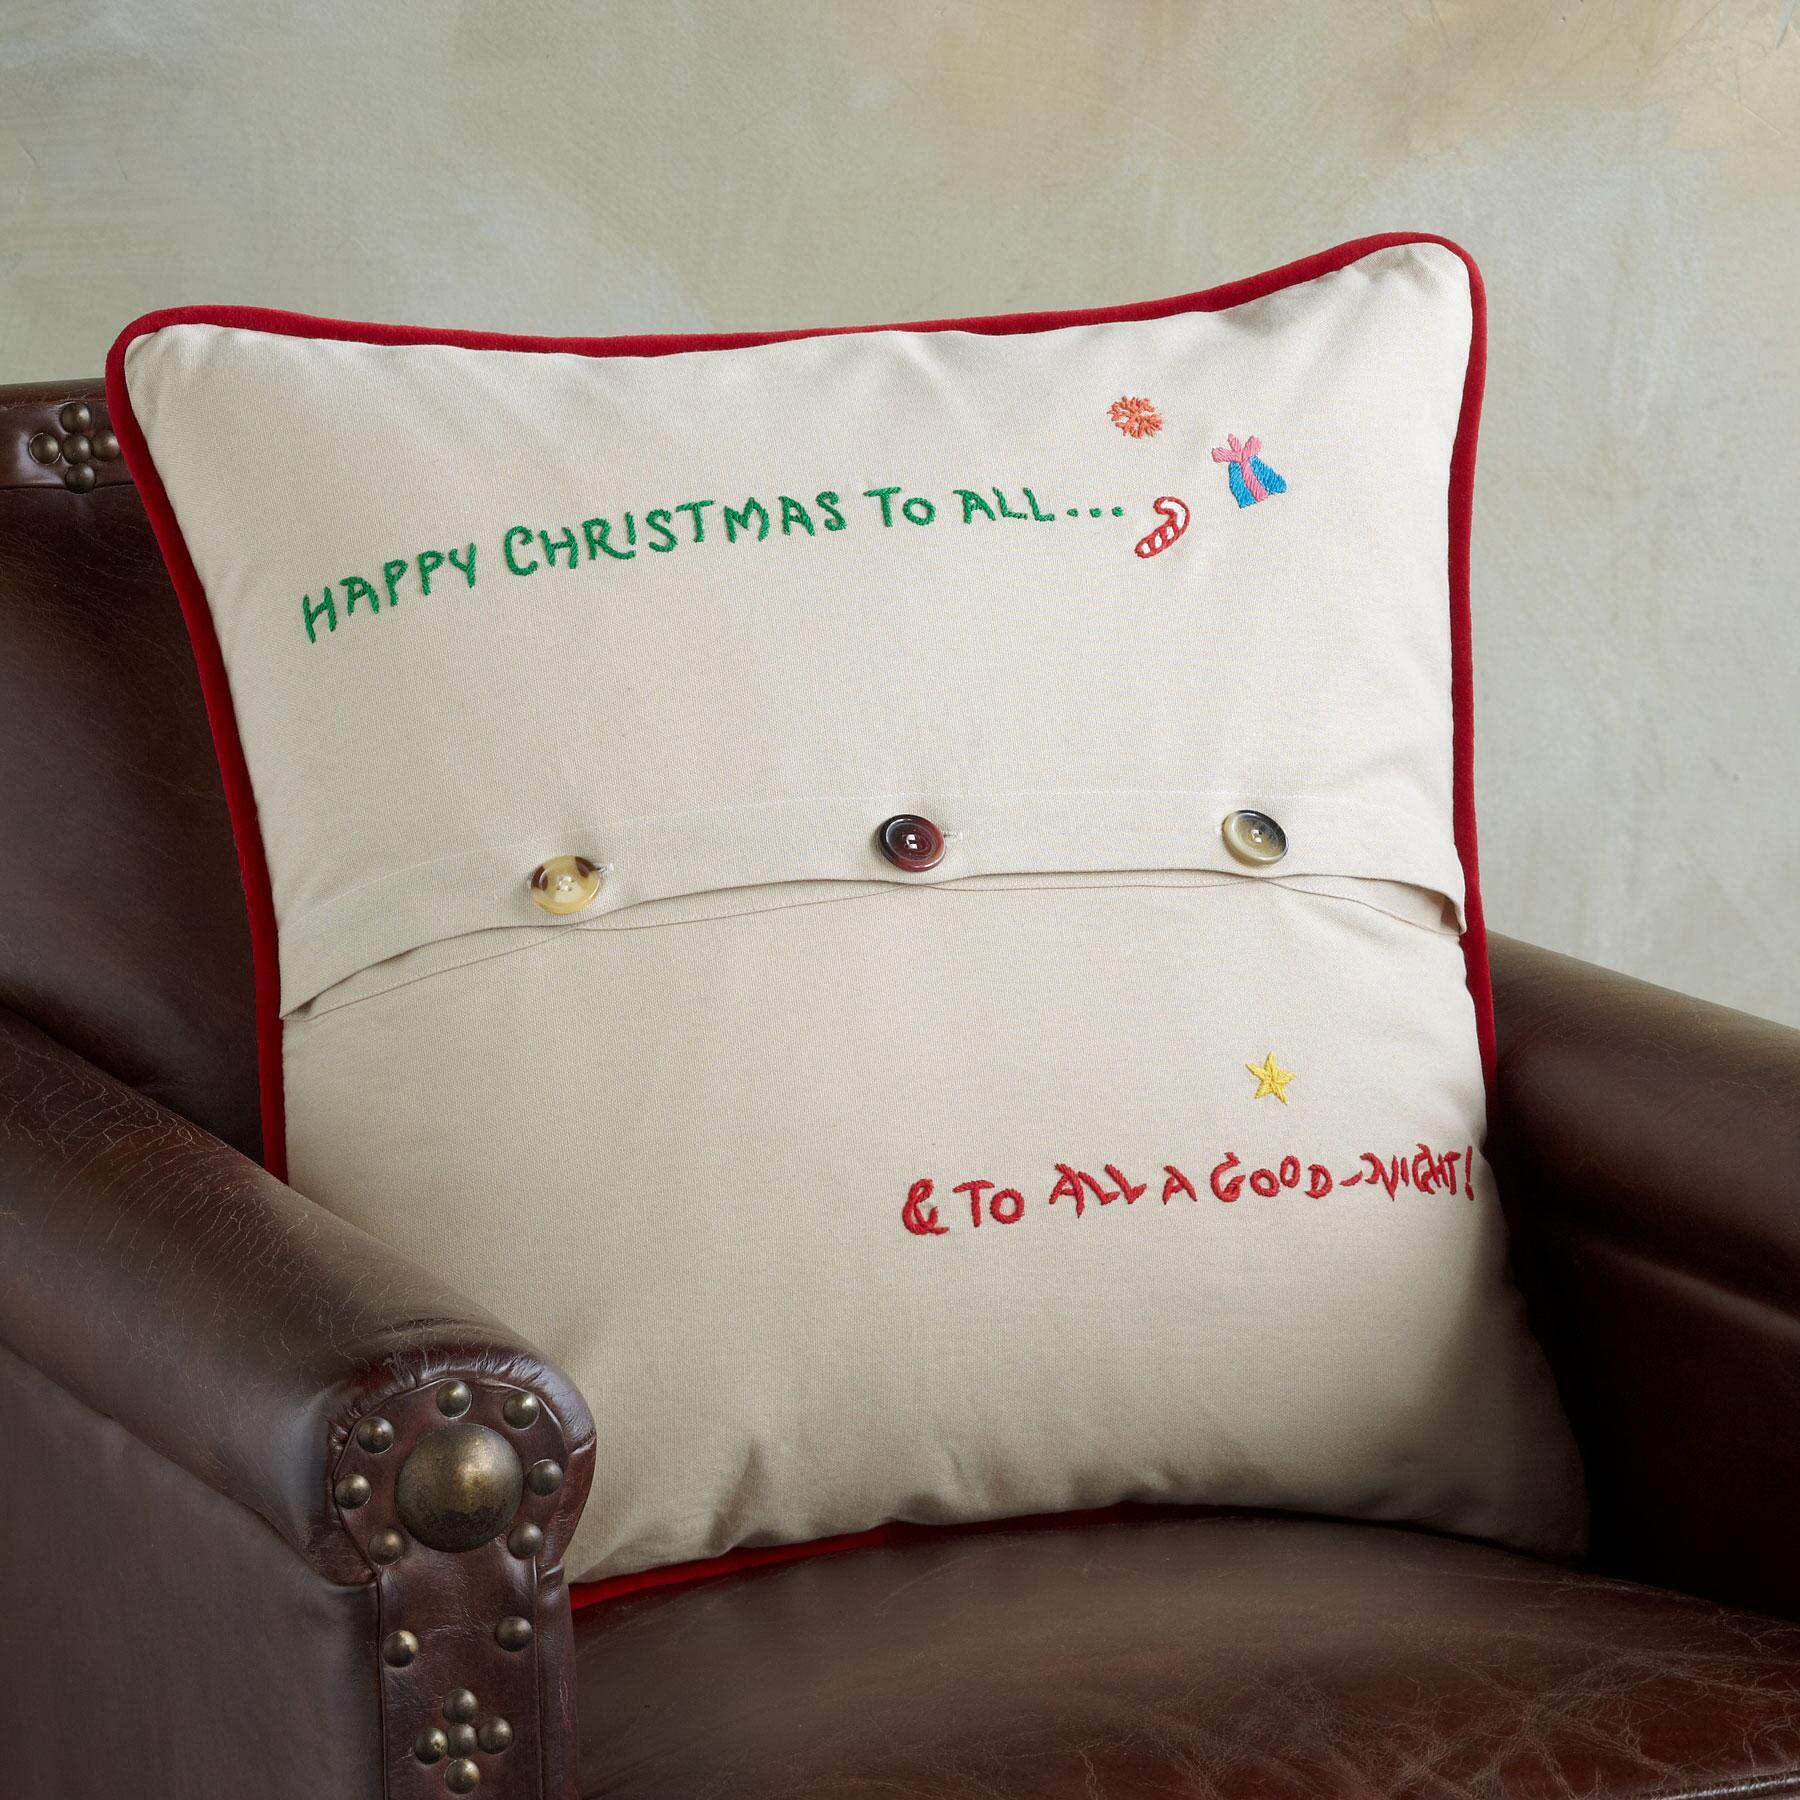 SOUVENIR NIGHT BEFORE CHRISTMAS PILLOW: View 2